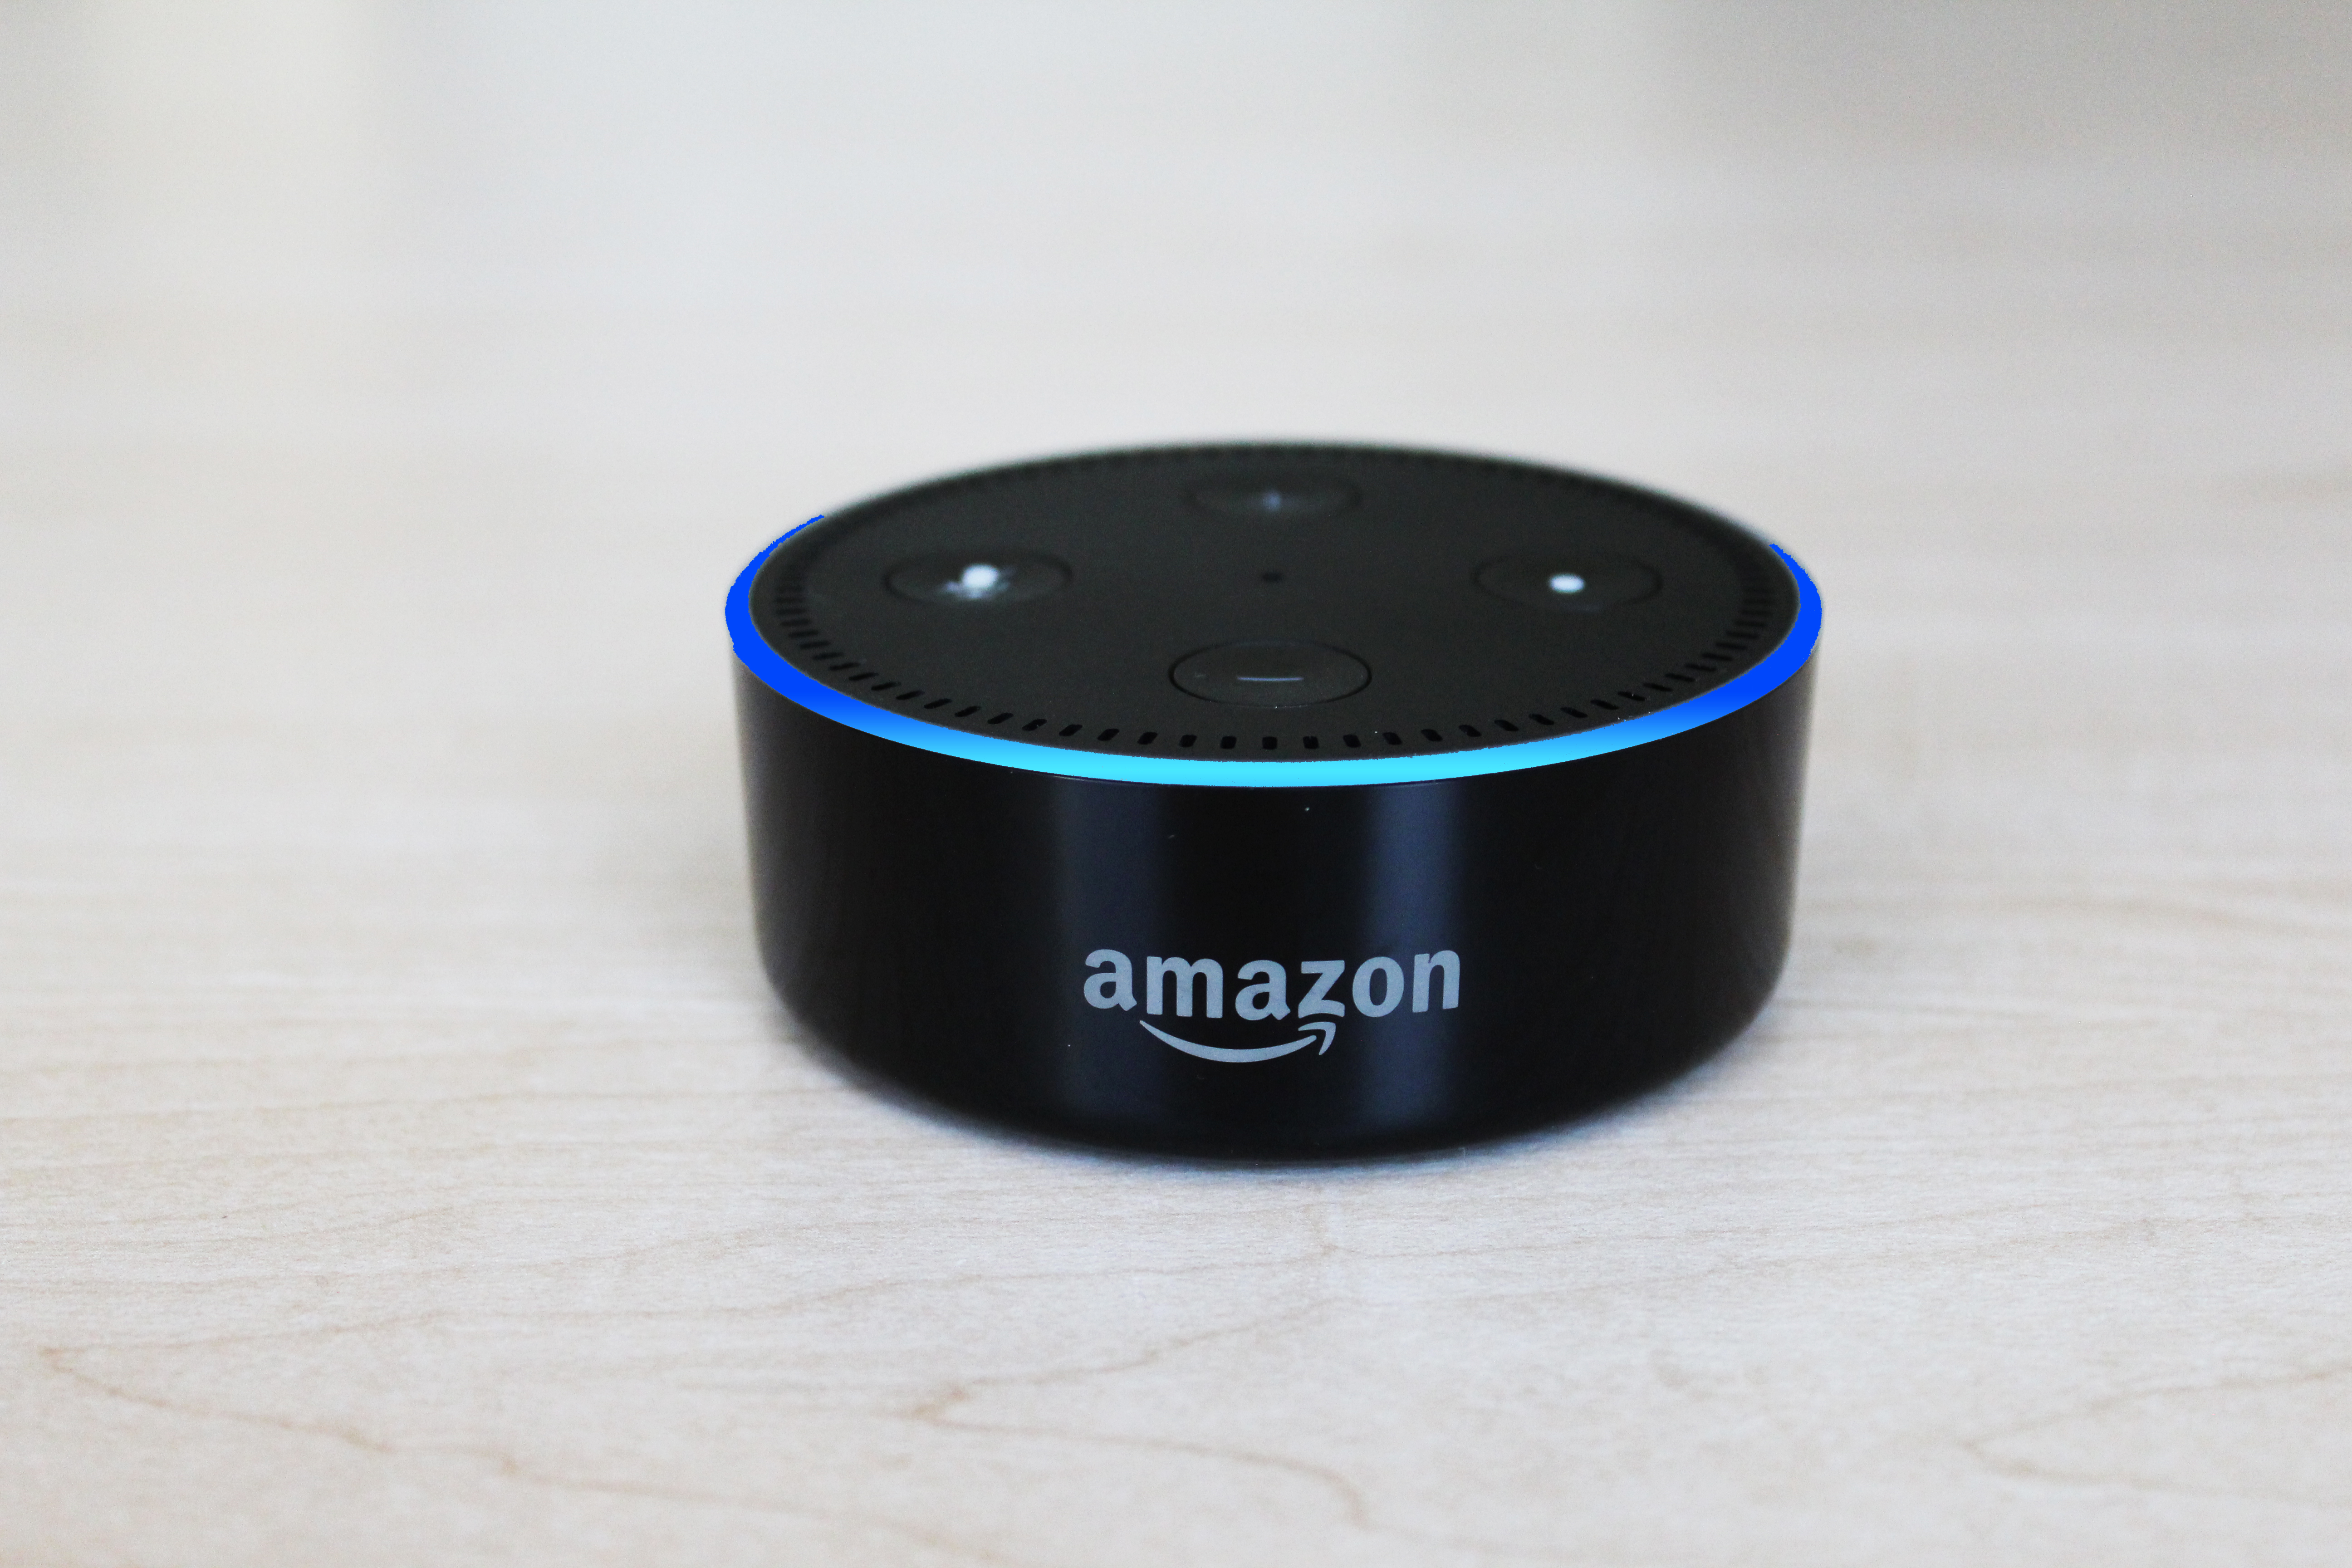 An Amazon Echo Alexa device on a table